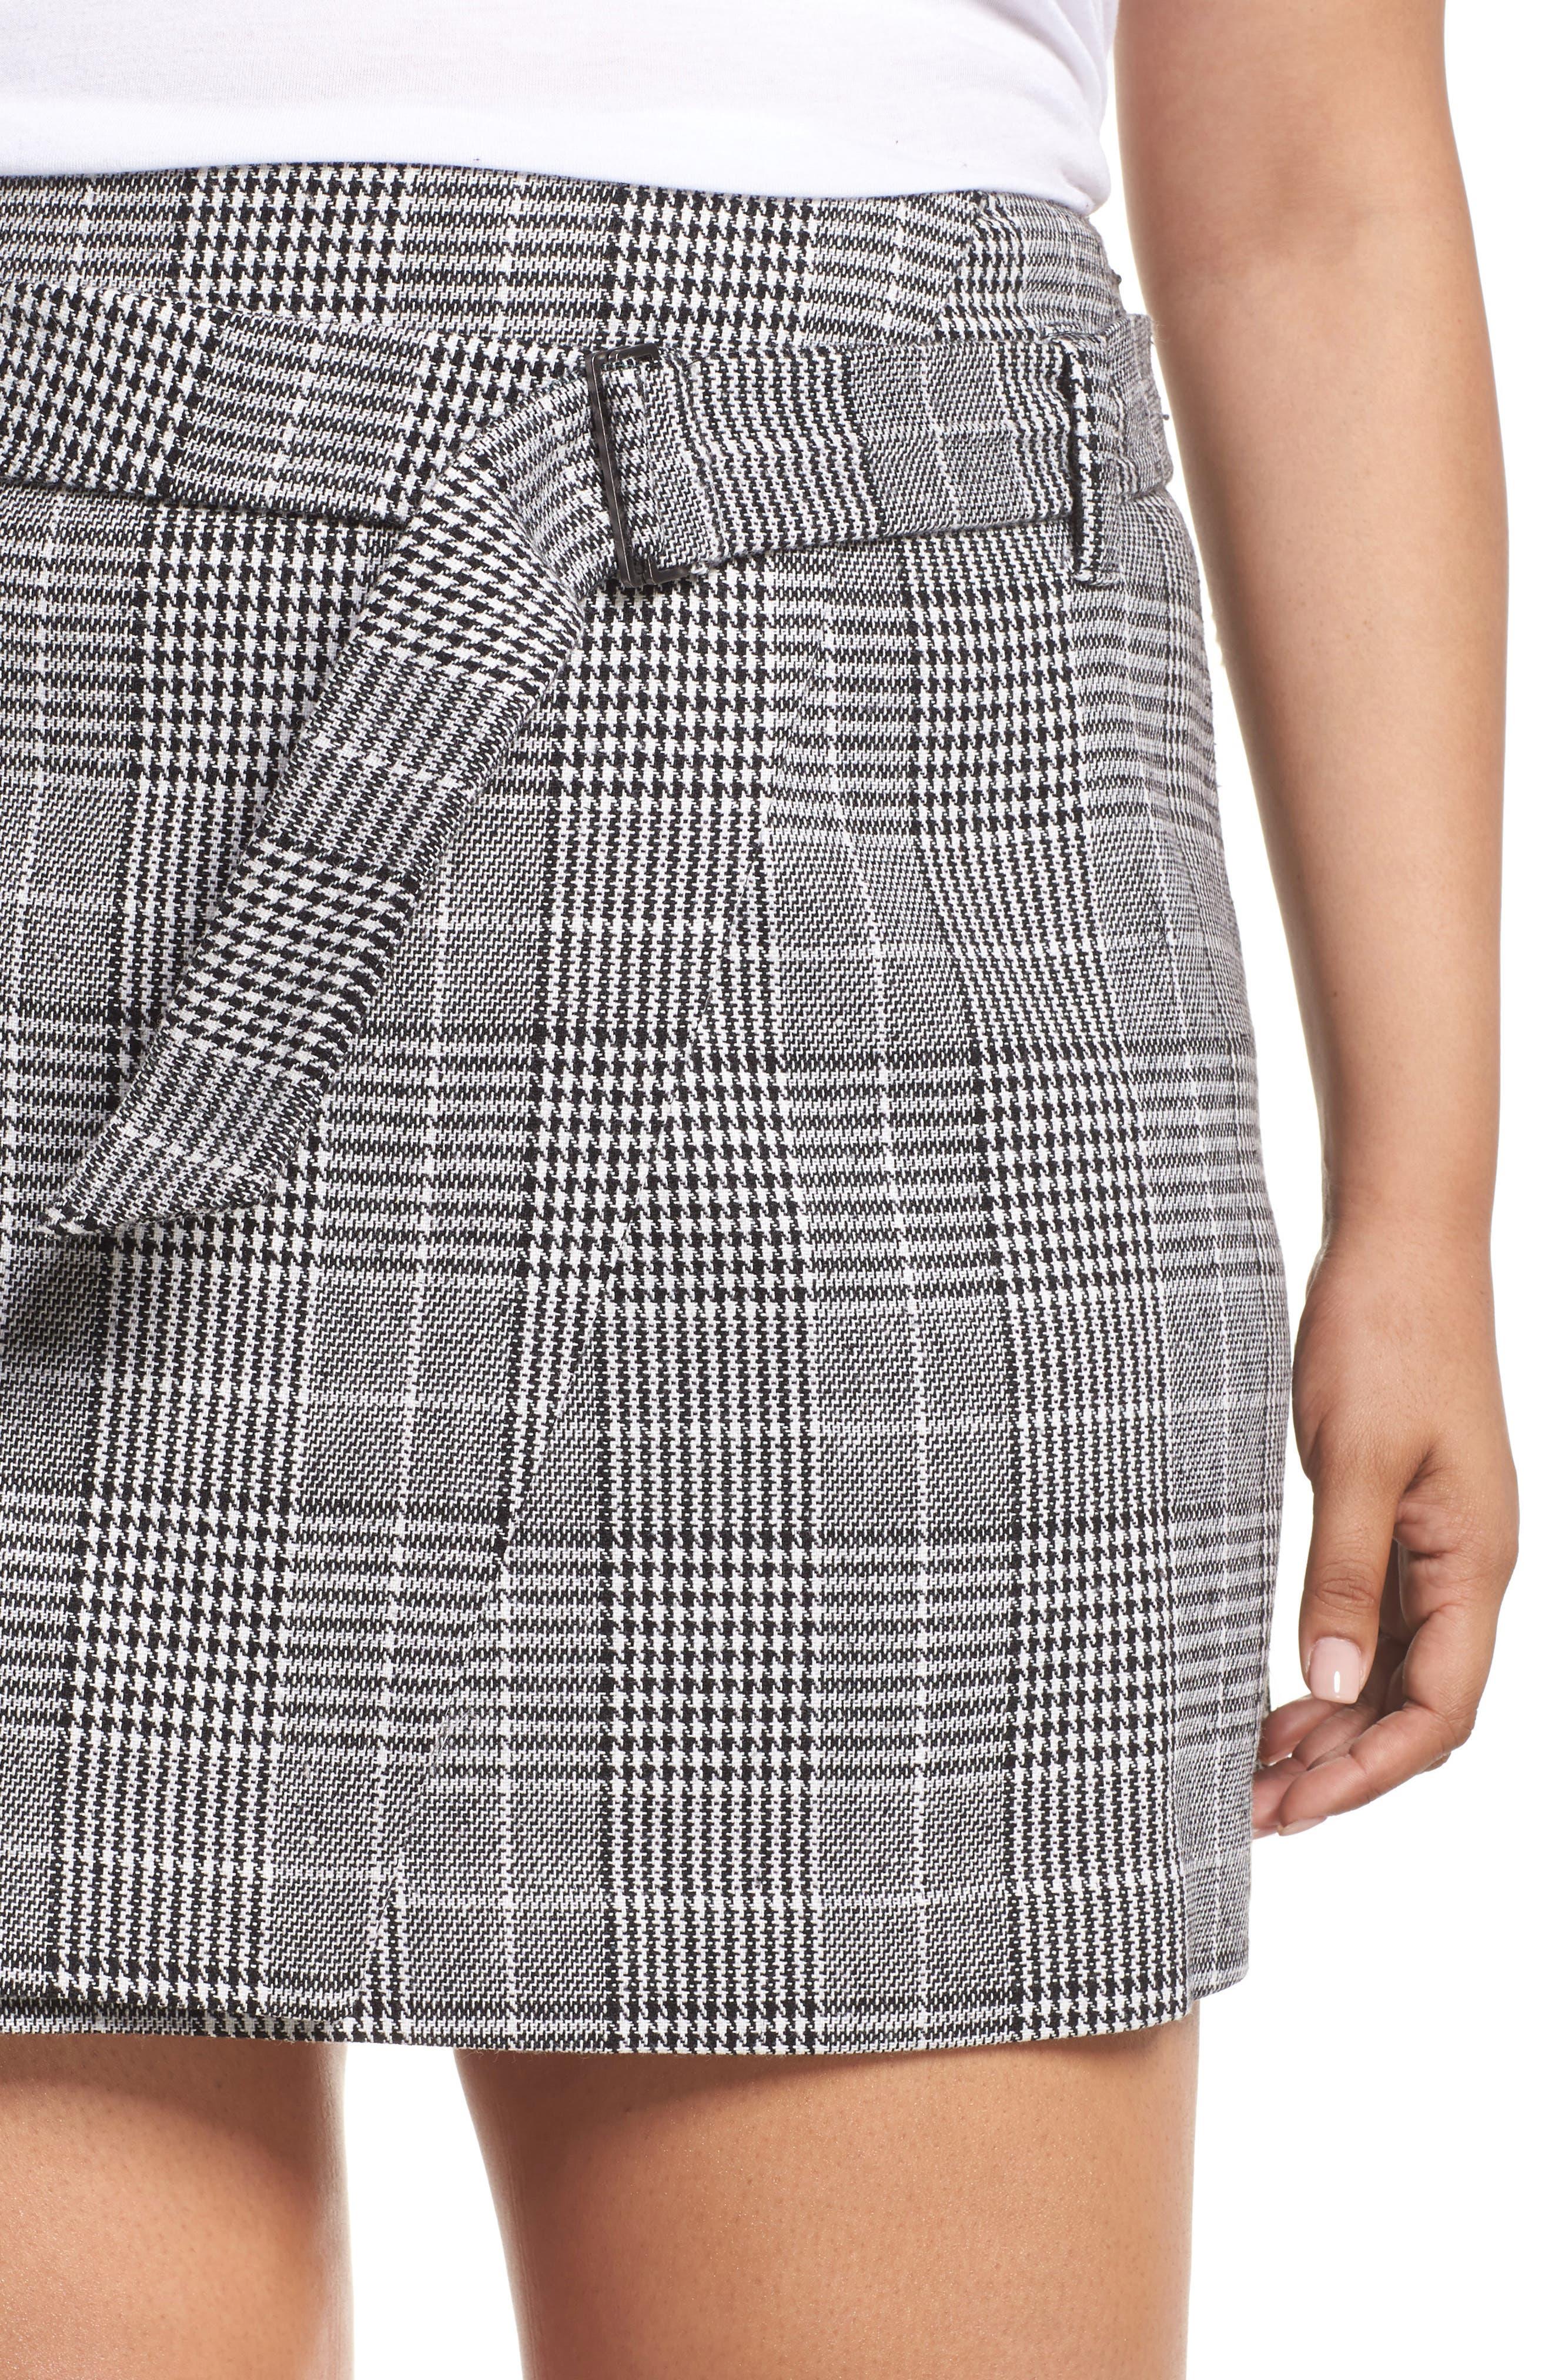 Plaid Miniskirt,                             Alternate thumbnail 10, color,                             BLACK SHAROL PLAID